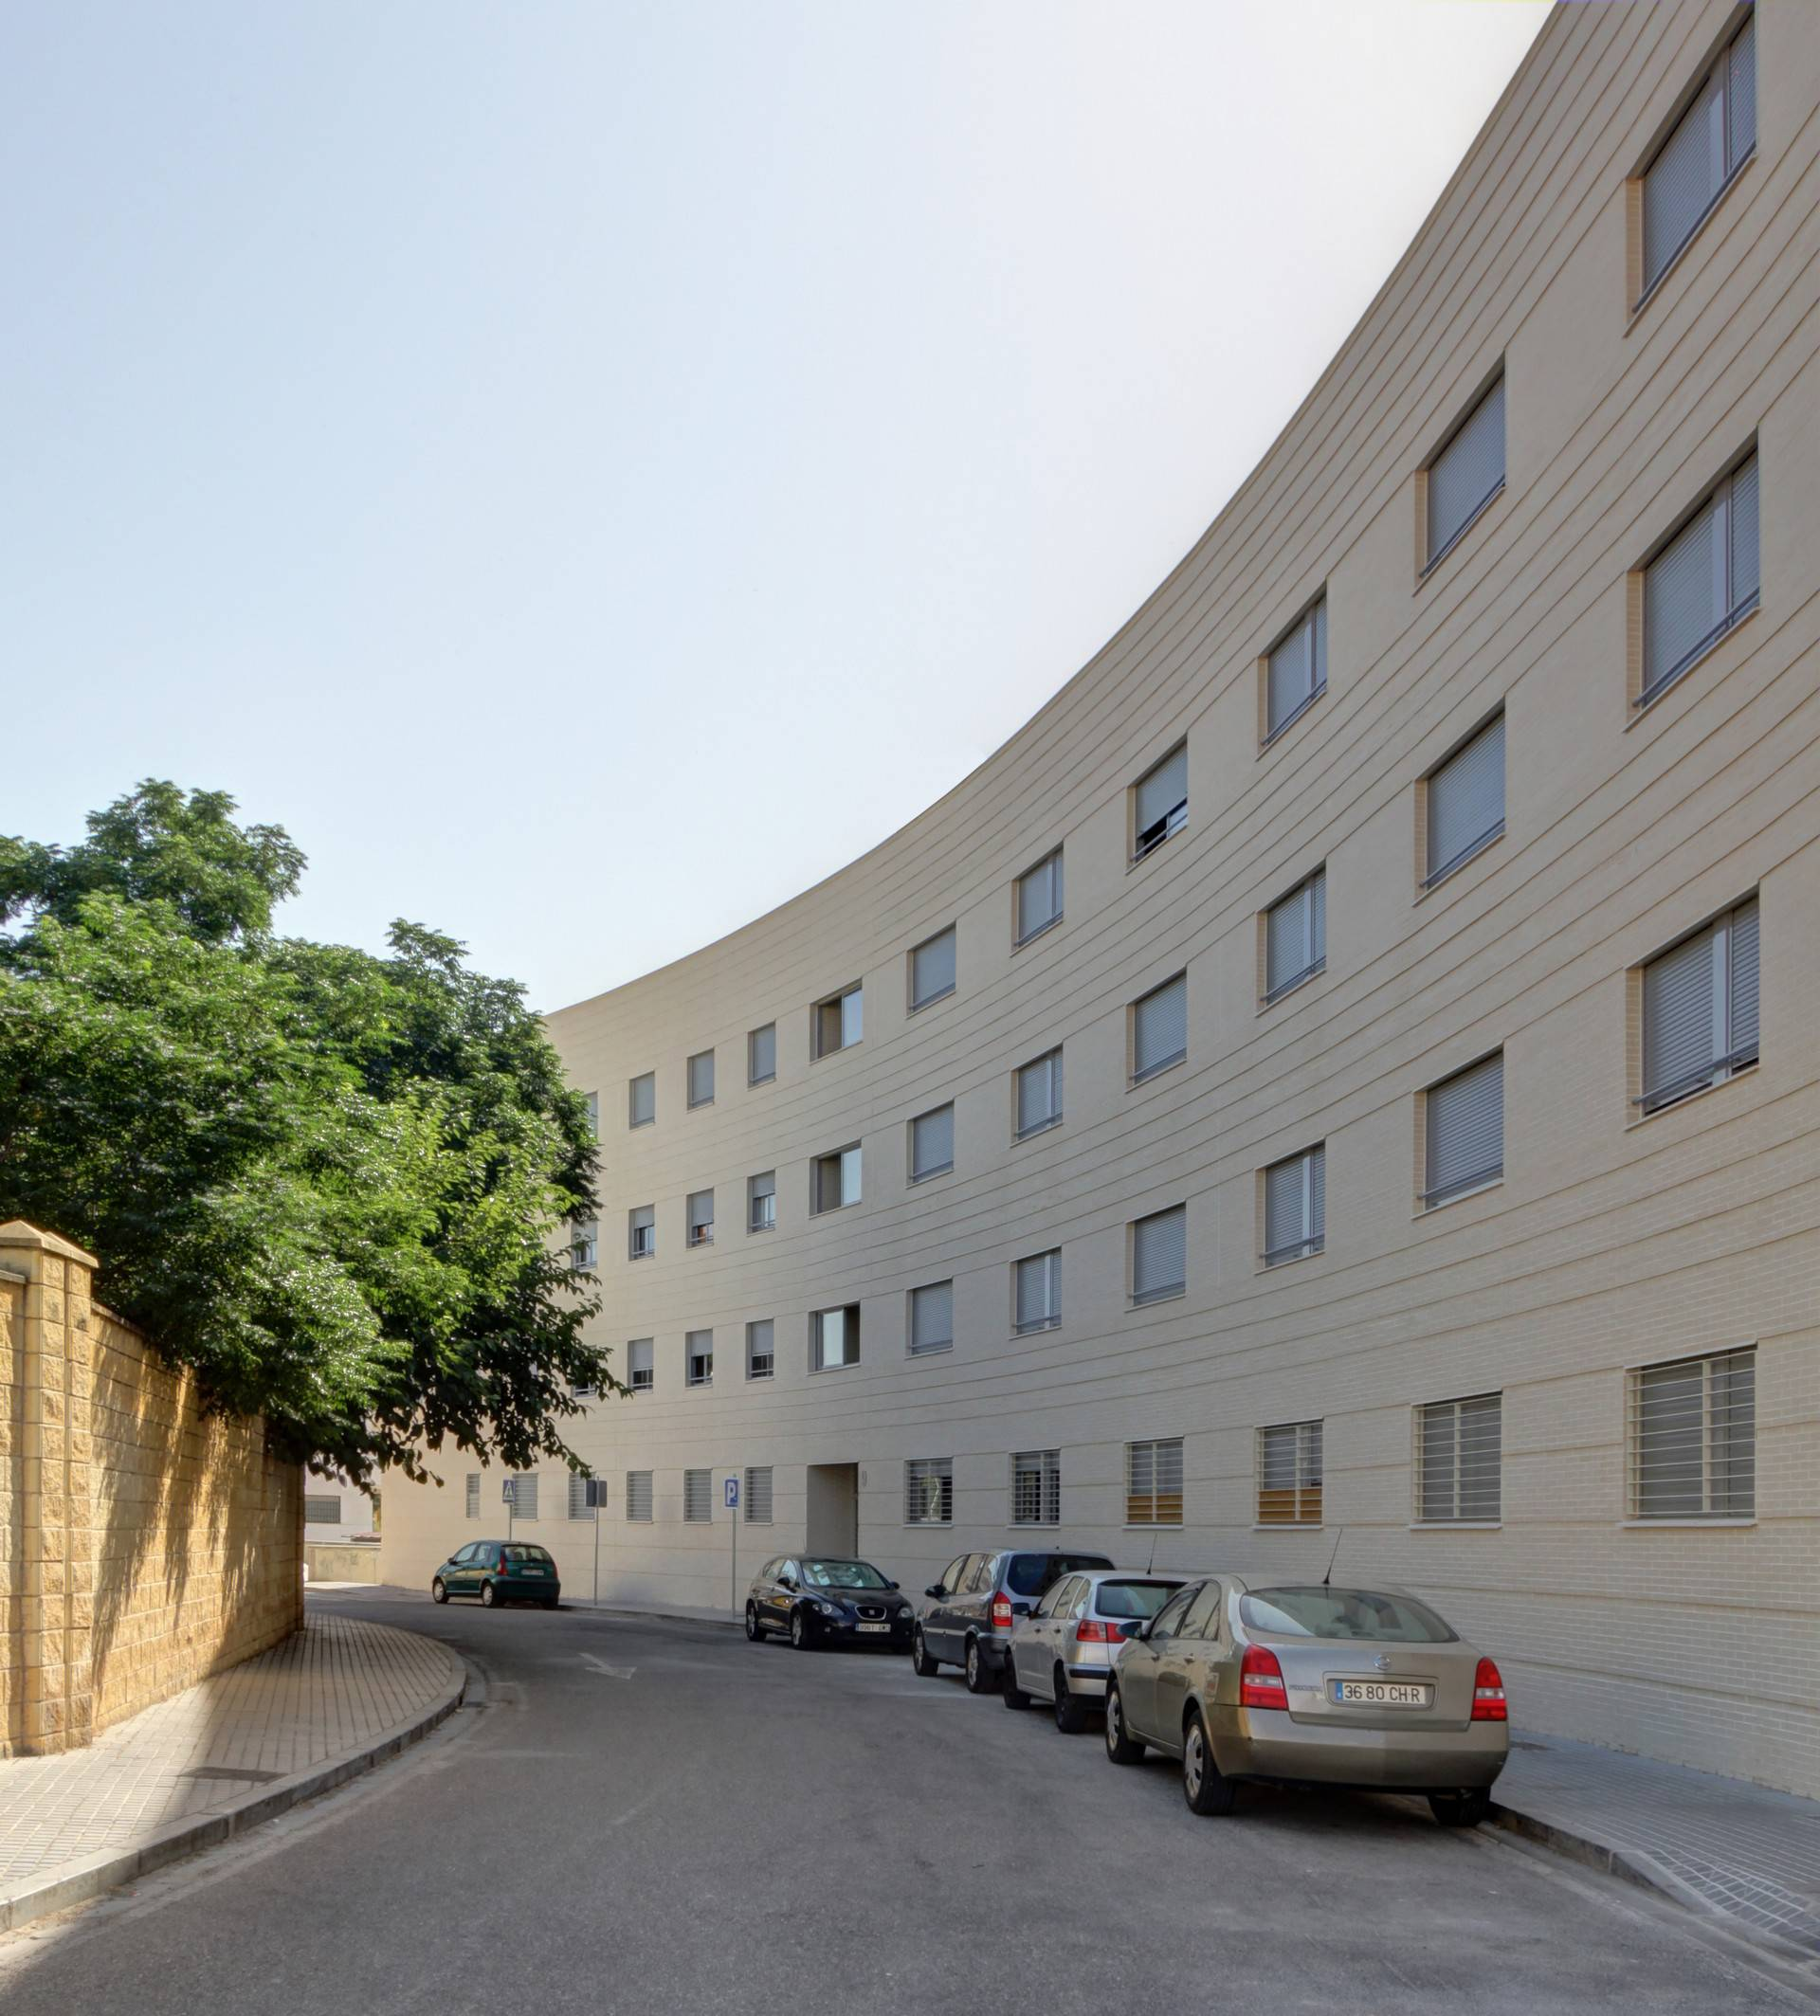 23 viviendas de protección oficial en Córdoba